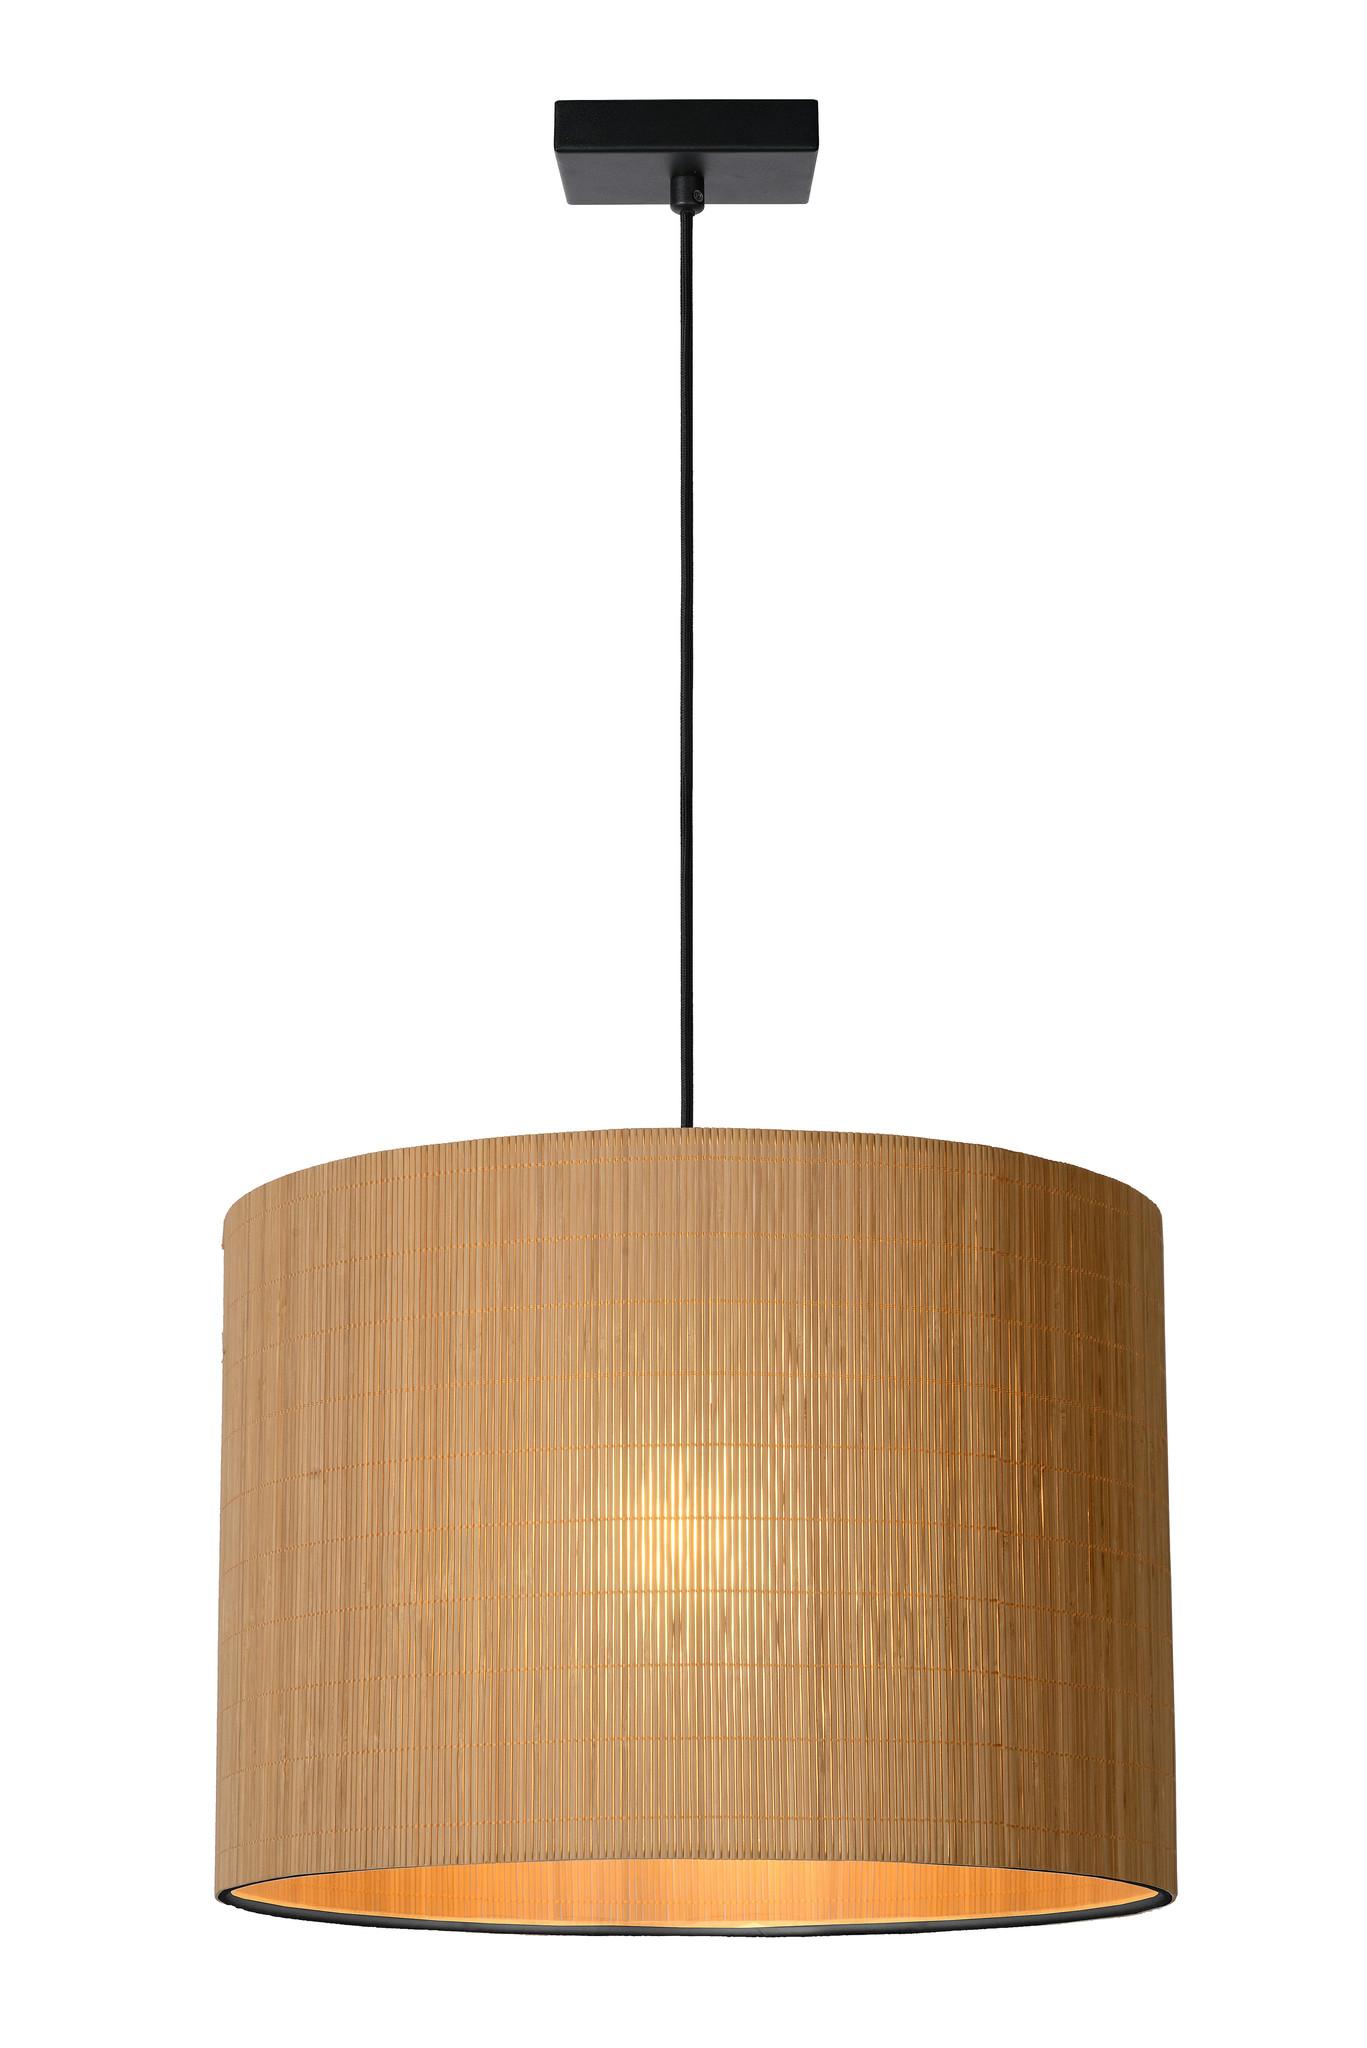 Lucide MAGIUS Hanglamp-Licht .-Ø42-1xE27-40W-Rotan